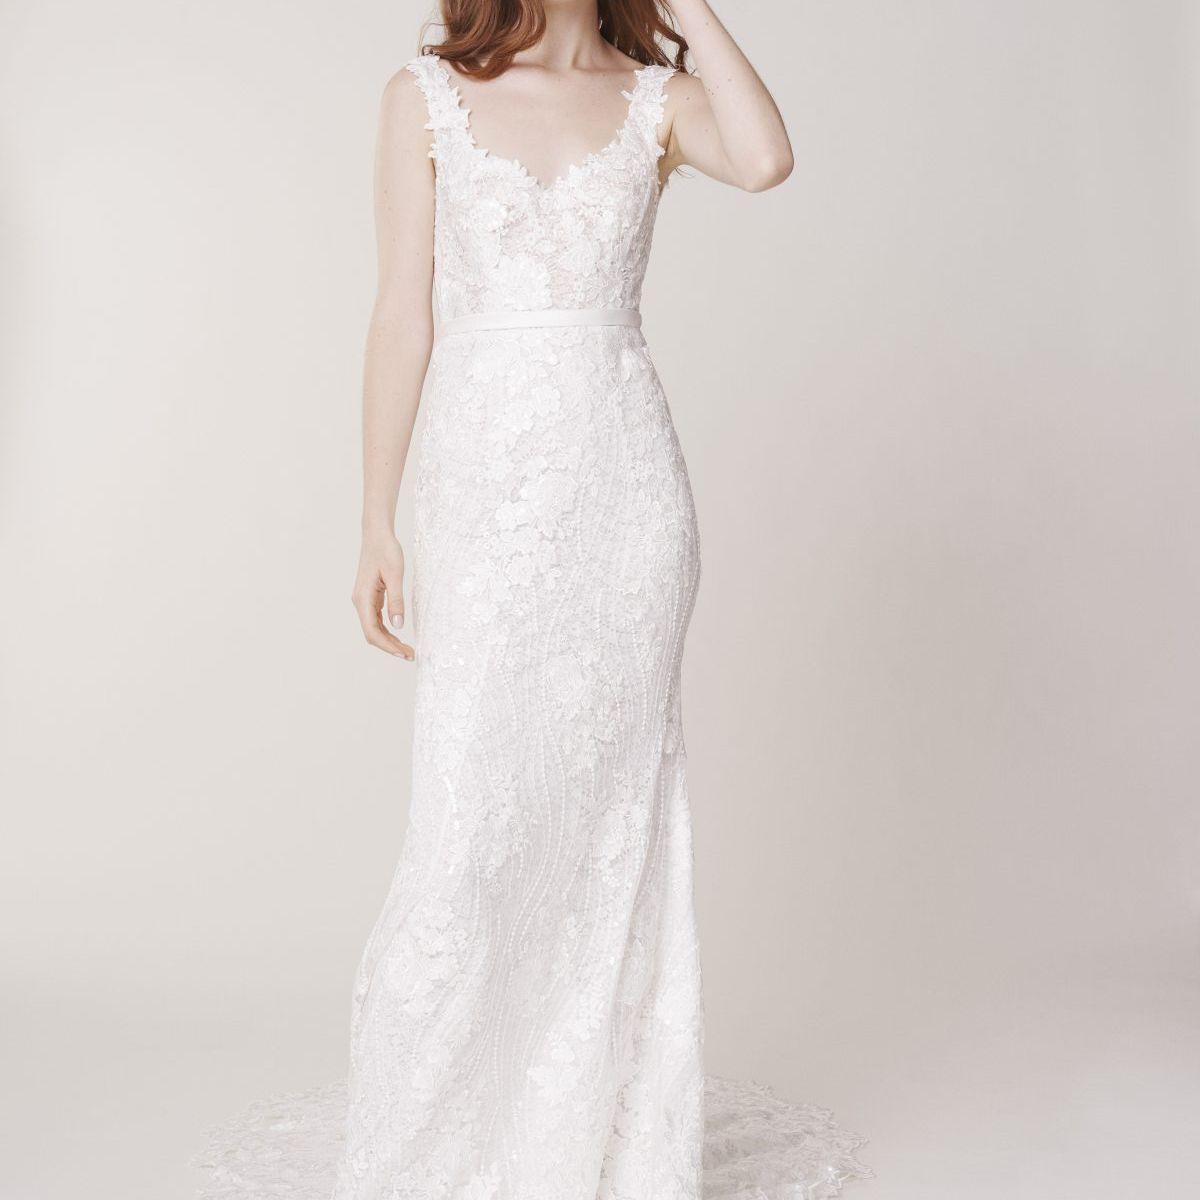 Alyne by Rita Vinieris Sleeveless Sweetheart Neckline Floral Sheath Wedding Dress $4,650